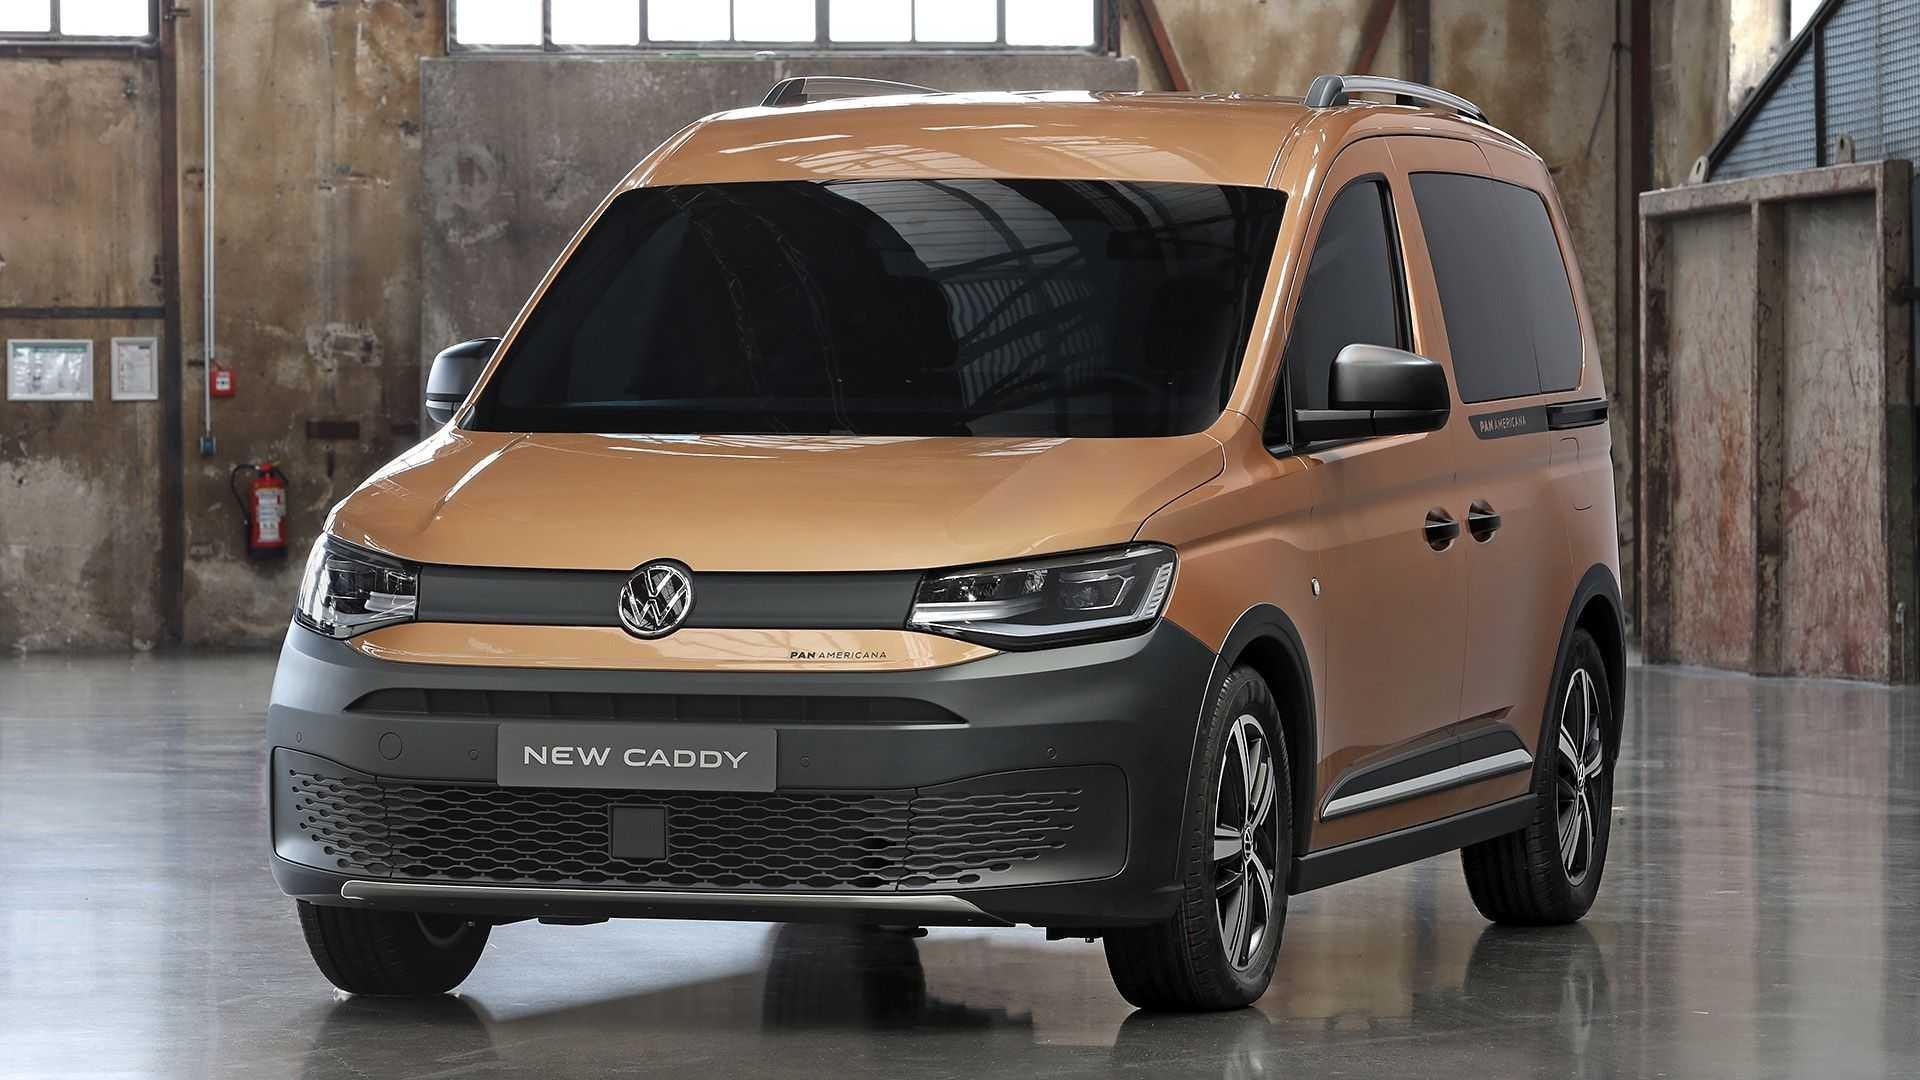 Volkswagen начал продавать туристический Caddy PanAmericana (фото)